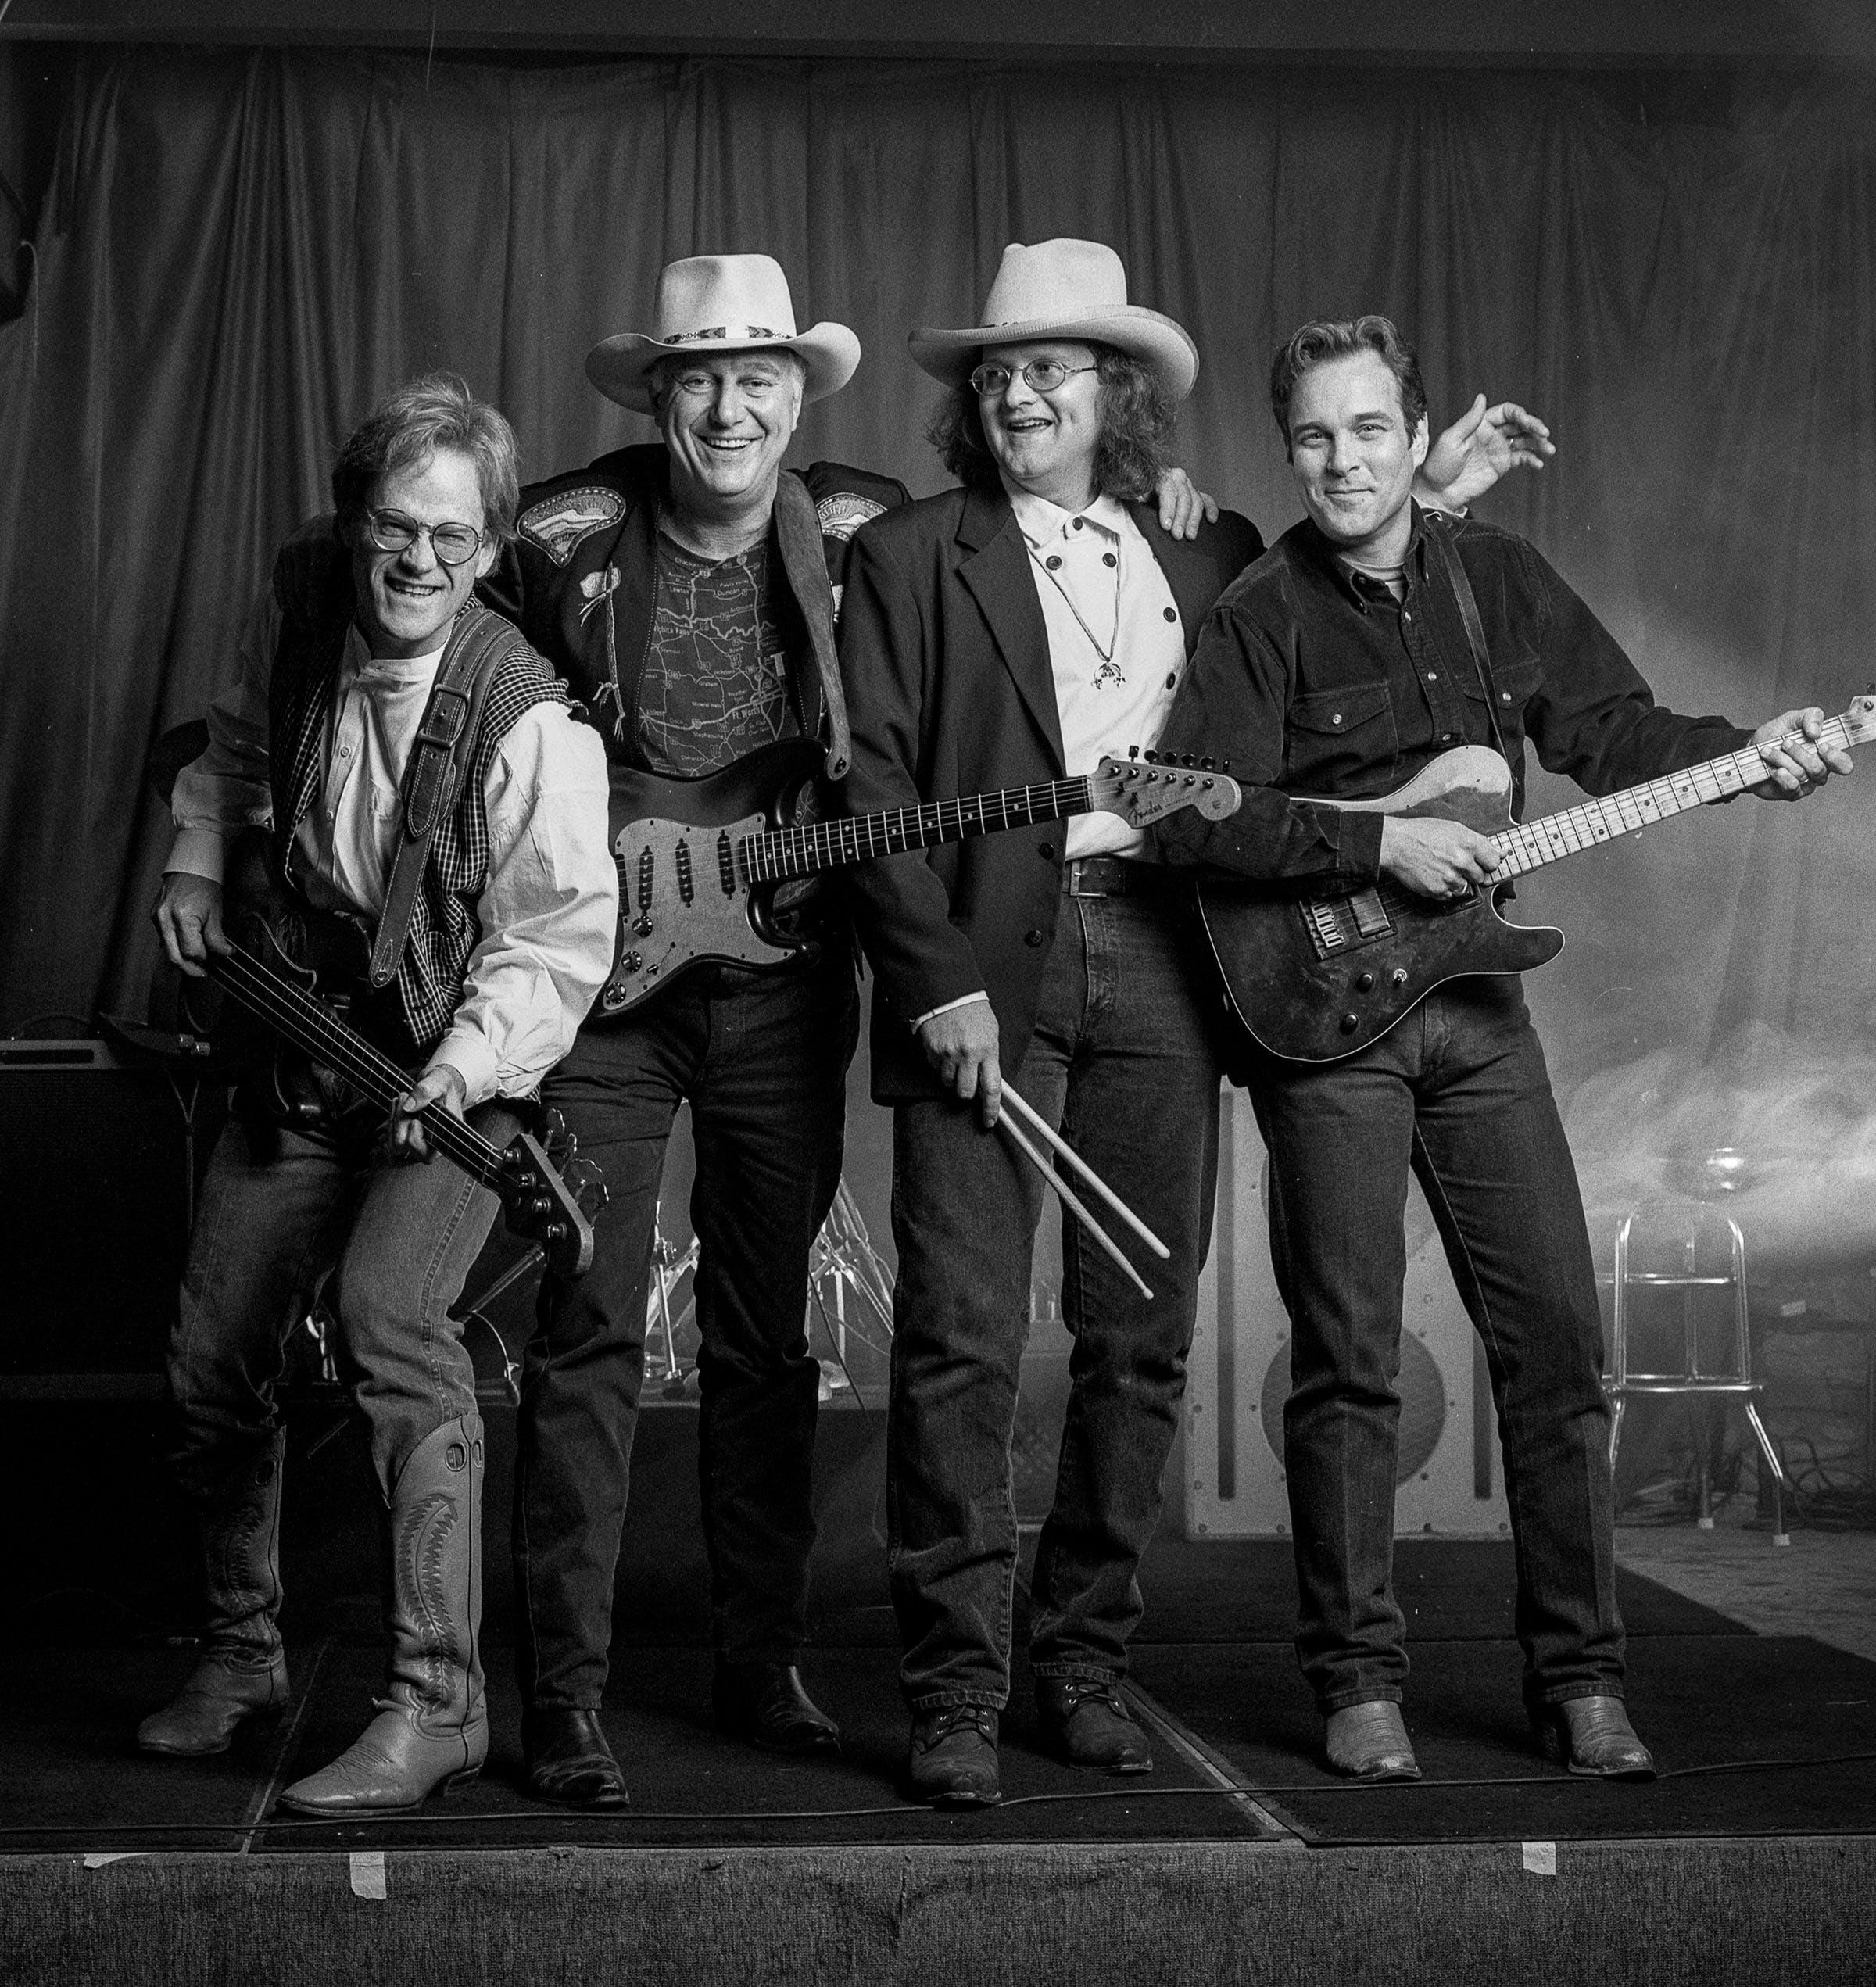 Bob Livingston, Jerry Jeff Walker, Freddie Krc, and John Inmon.